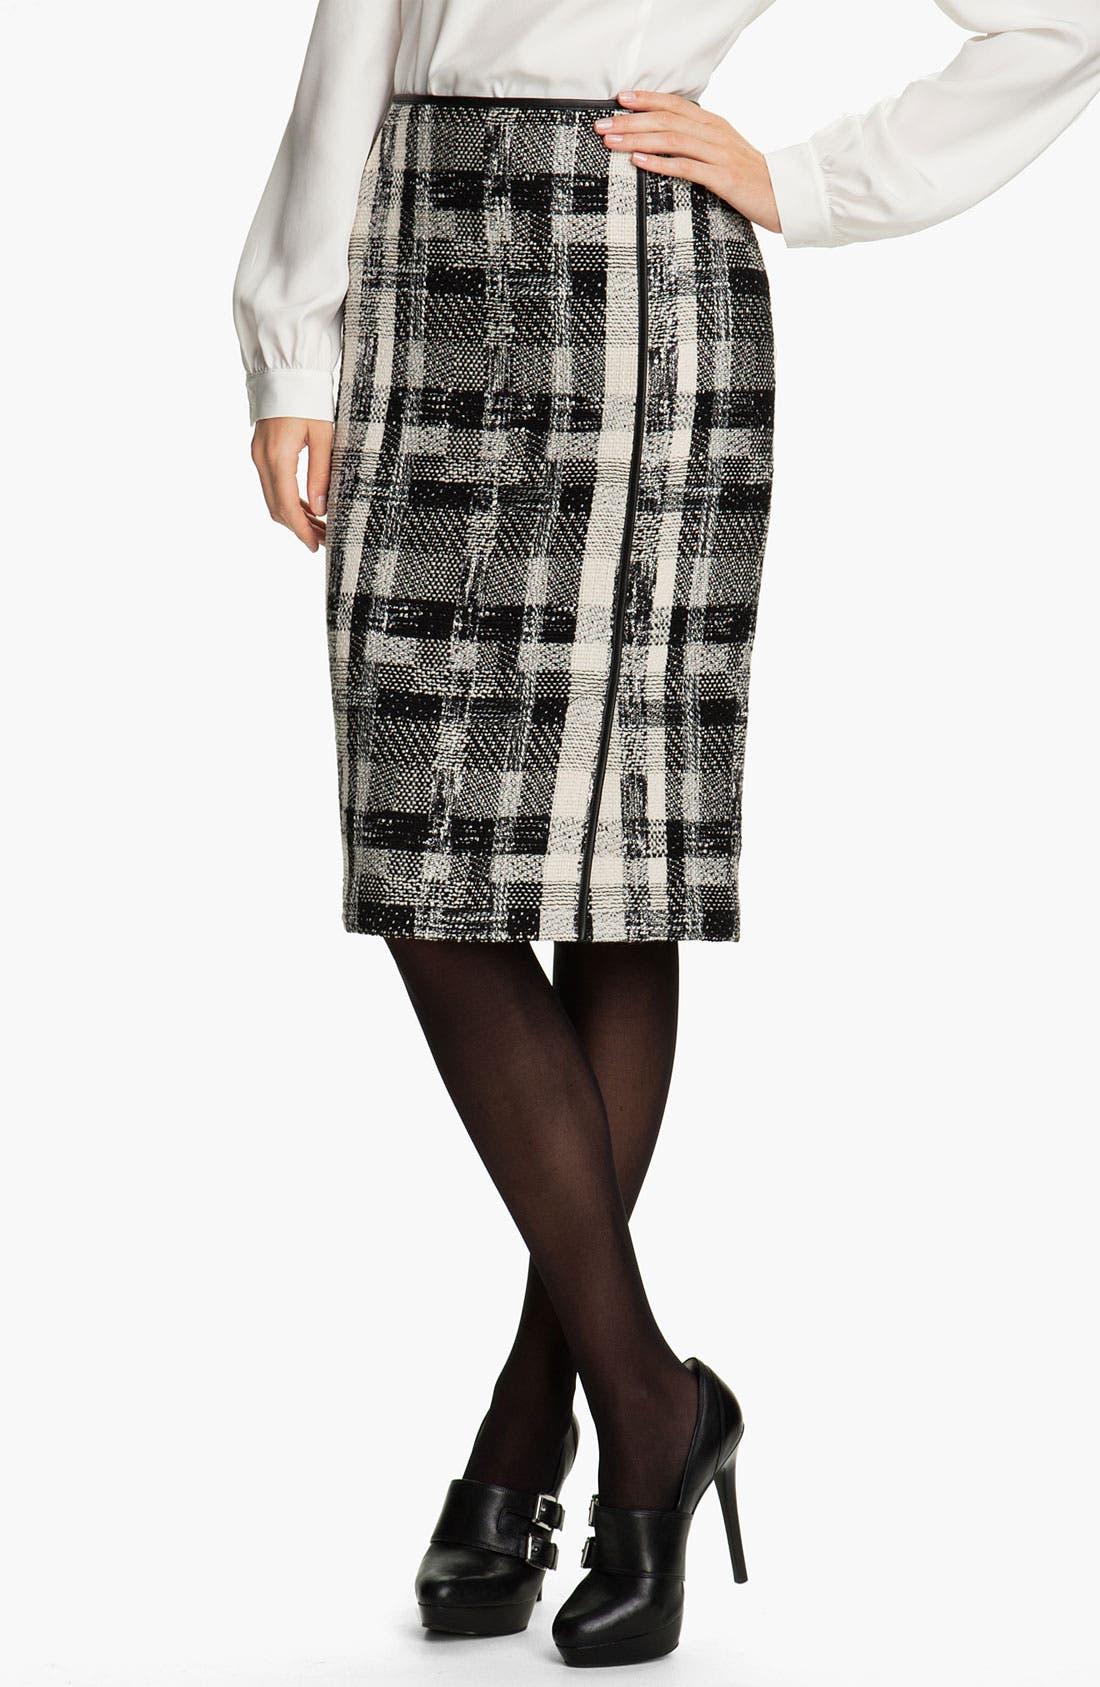 Alternate Image 1 Selected - Lafayette 148 New York Fragmented Tweed Skirt